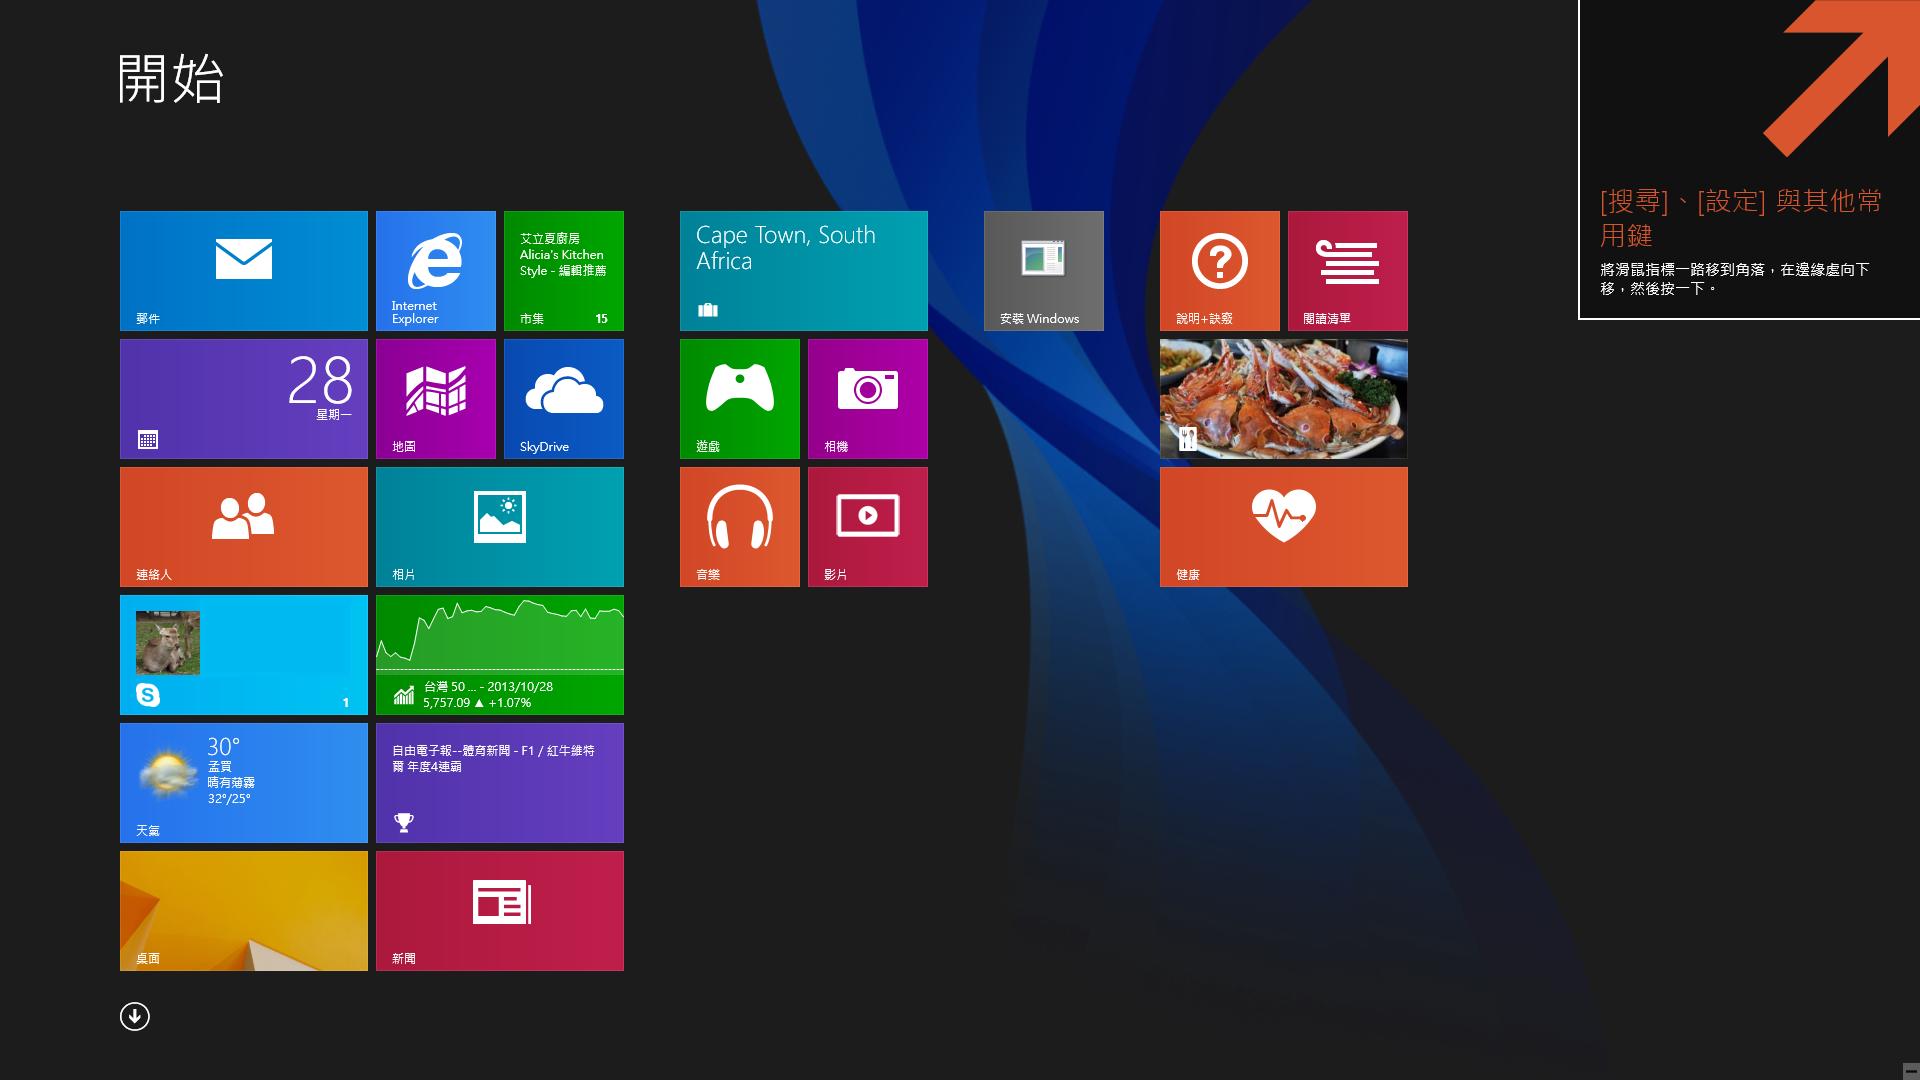 Windows 81 Start Page 微軟 Windows 8.1 作業系統全新安裝紀錄